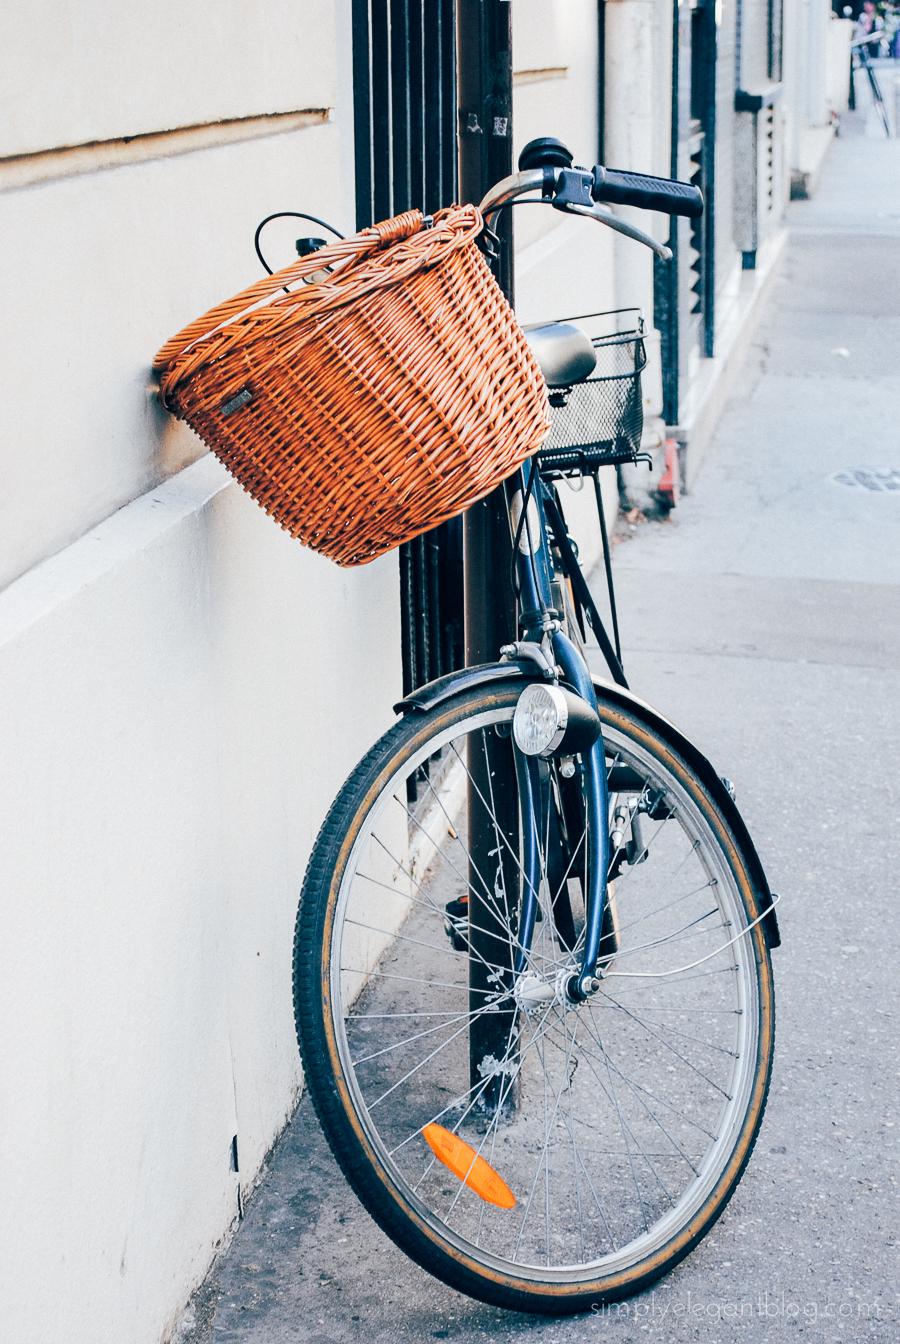 Simply Elegant / Paris Vacation Photographs - Bike Basket